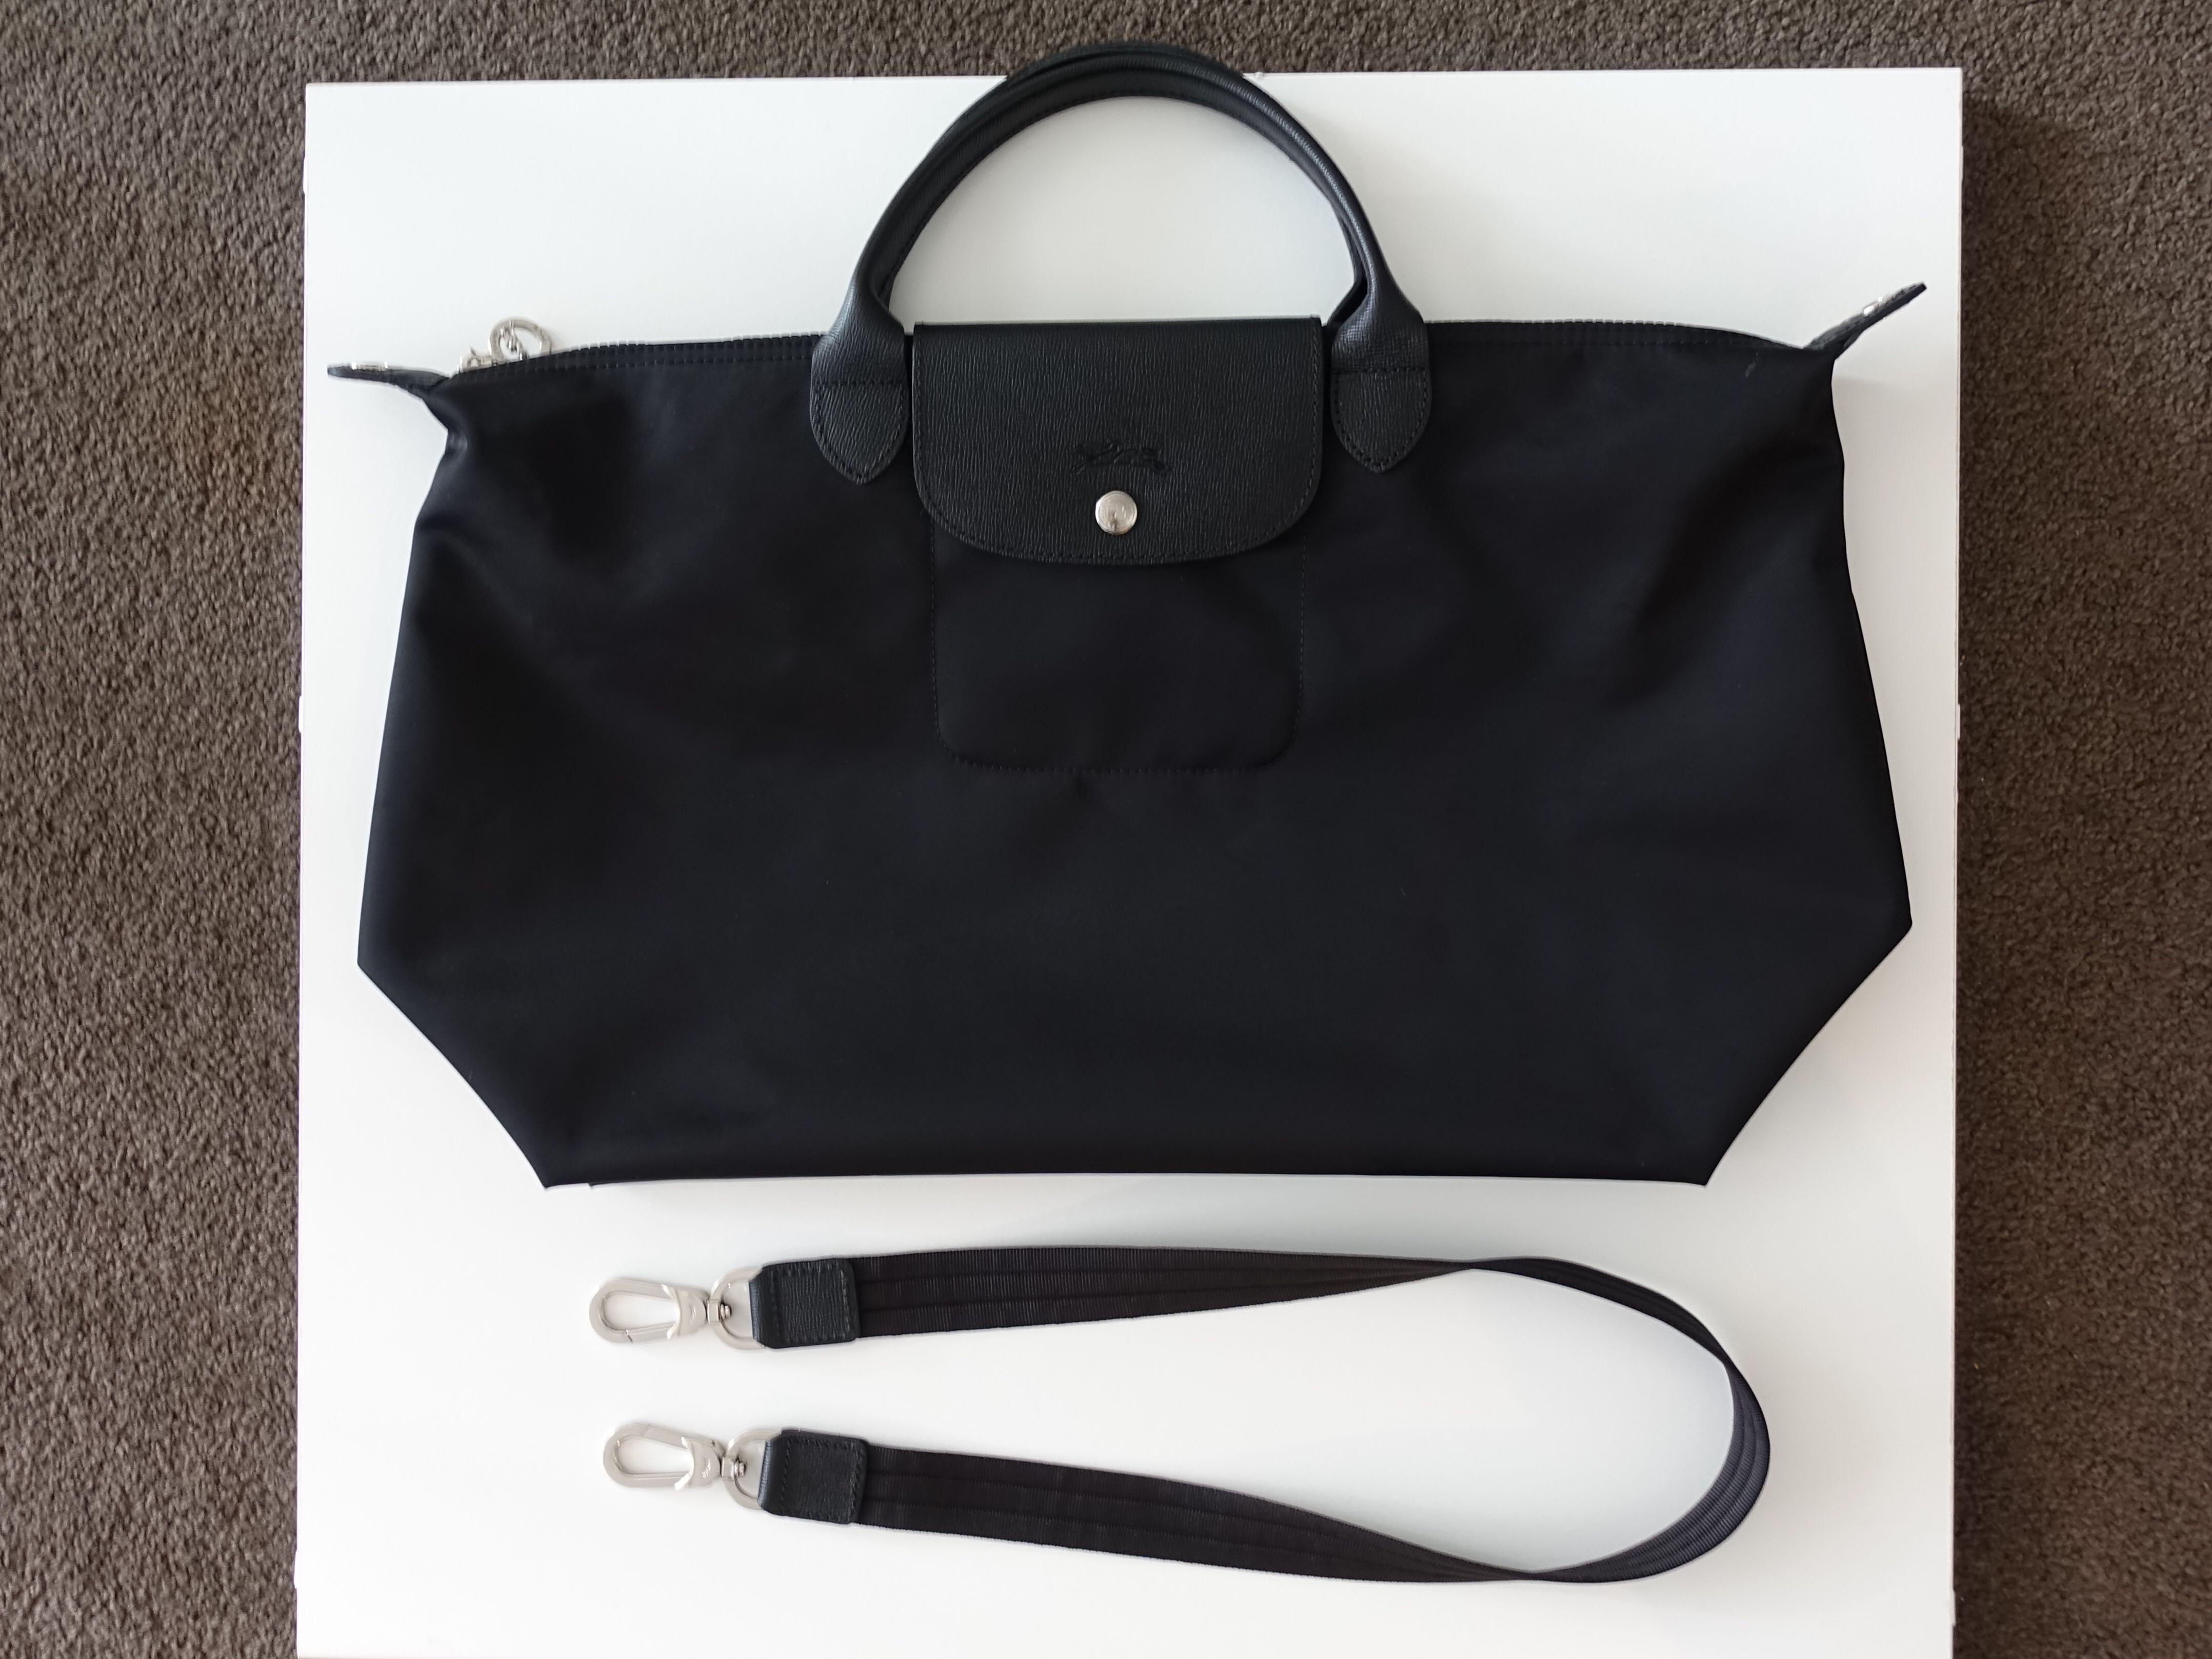 270d7c6fe0f Longchamp Le Pliage Neo Large Top Handle Handbag, Women's Fashion, Bags &  Wallets on Carousell